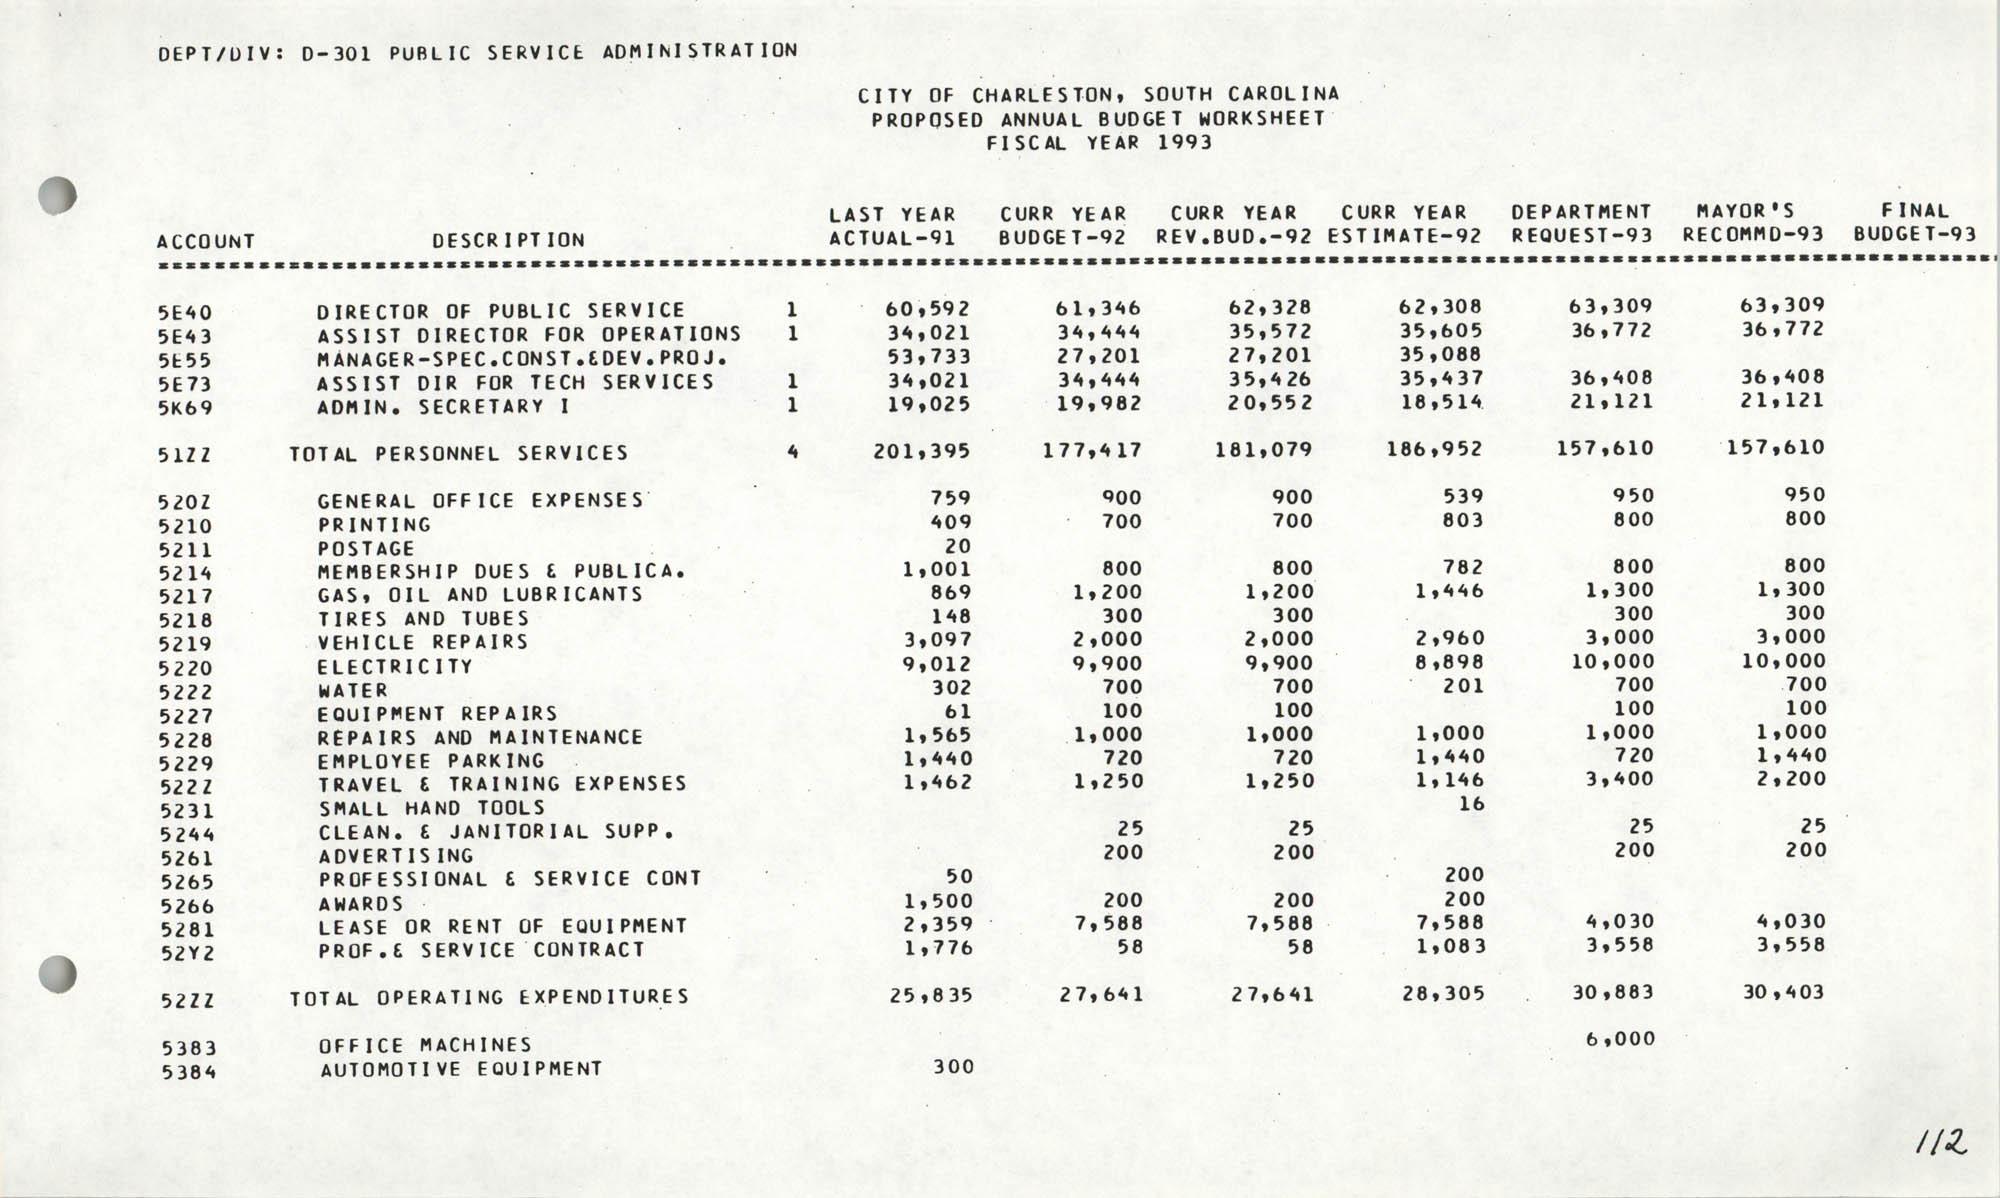 The City Council of Charleston, South Carolina, 1993 Budget, Page 112